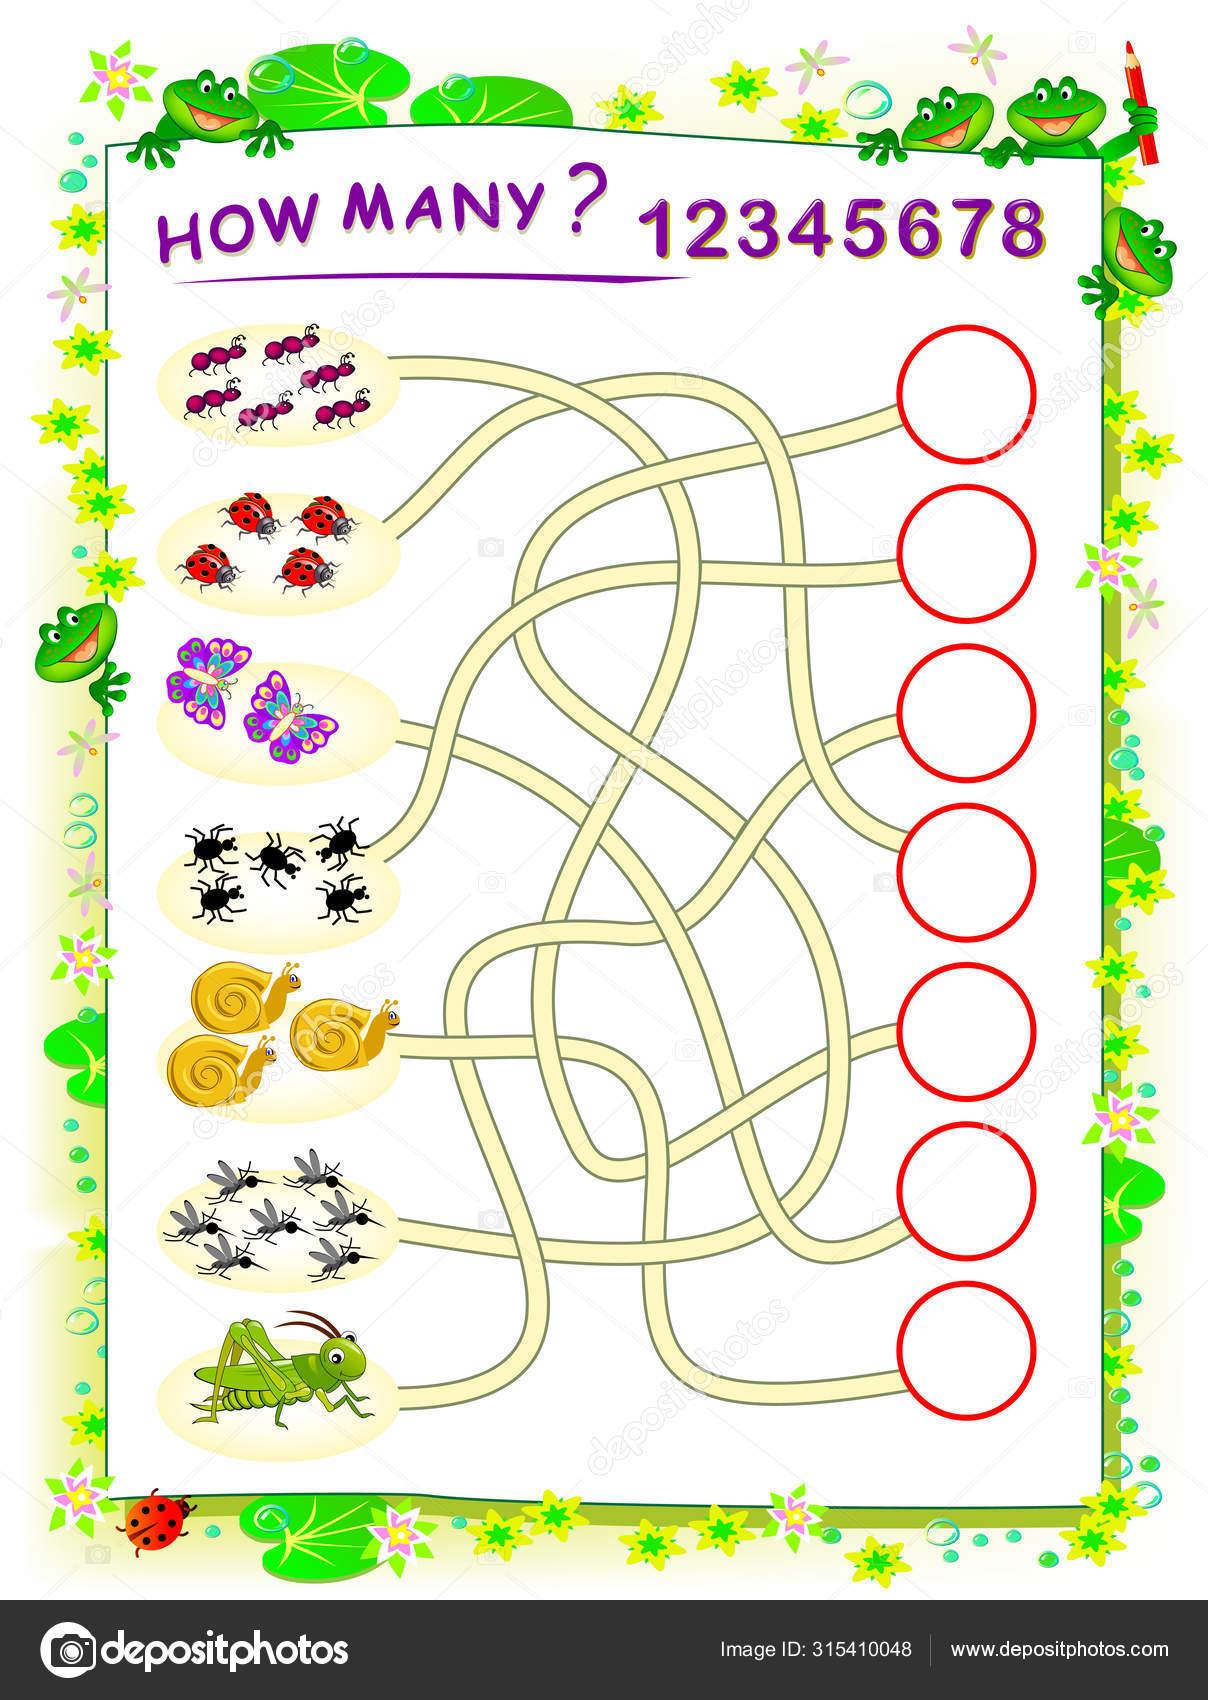 Logik Pusselspel For Barn Med Labyrint Tryckbart